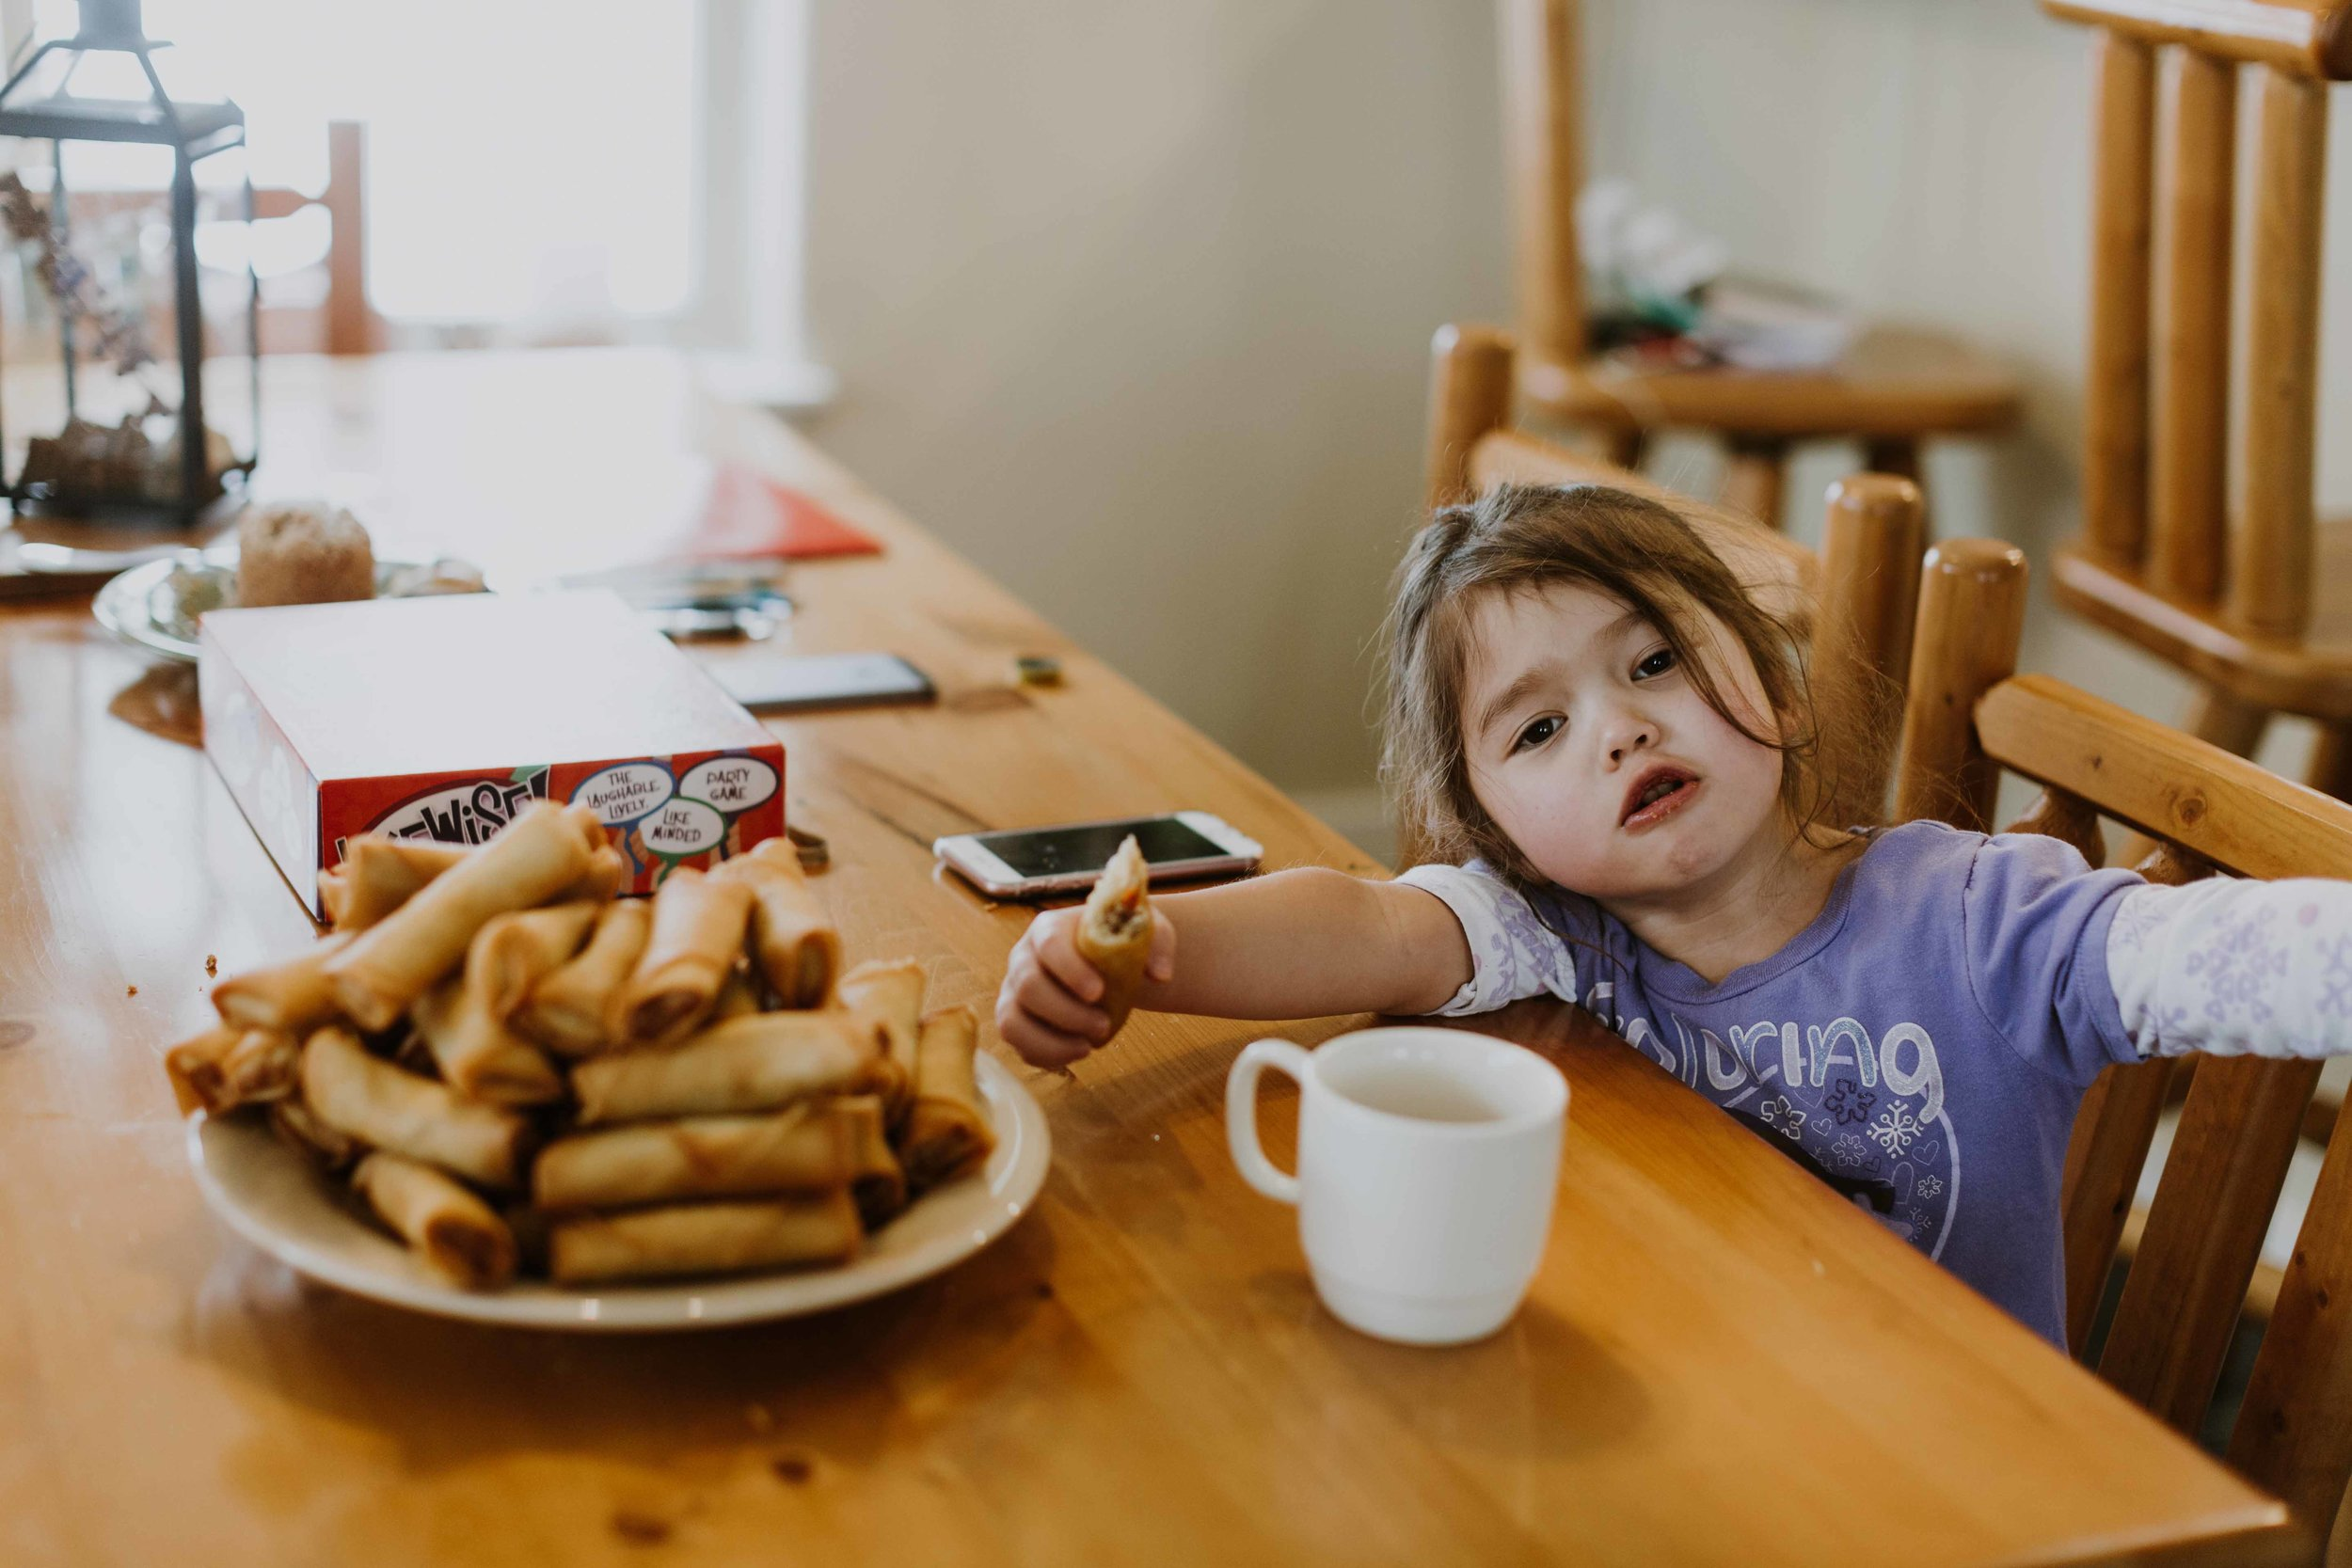 life-with-sydney-eggrolls-4.jpg